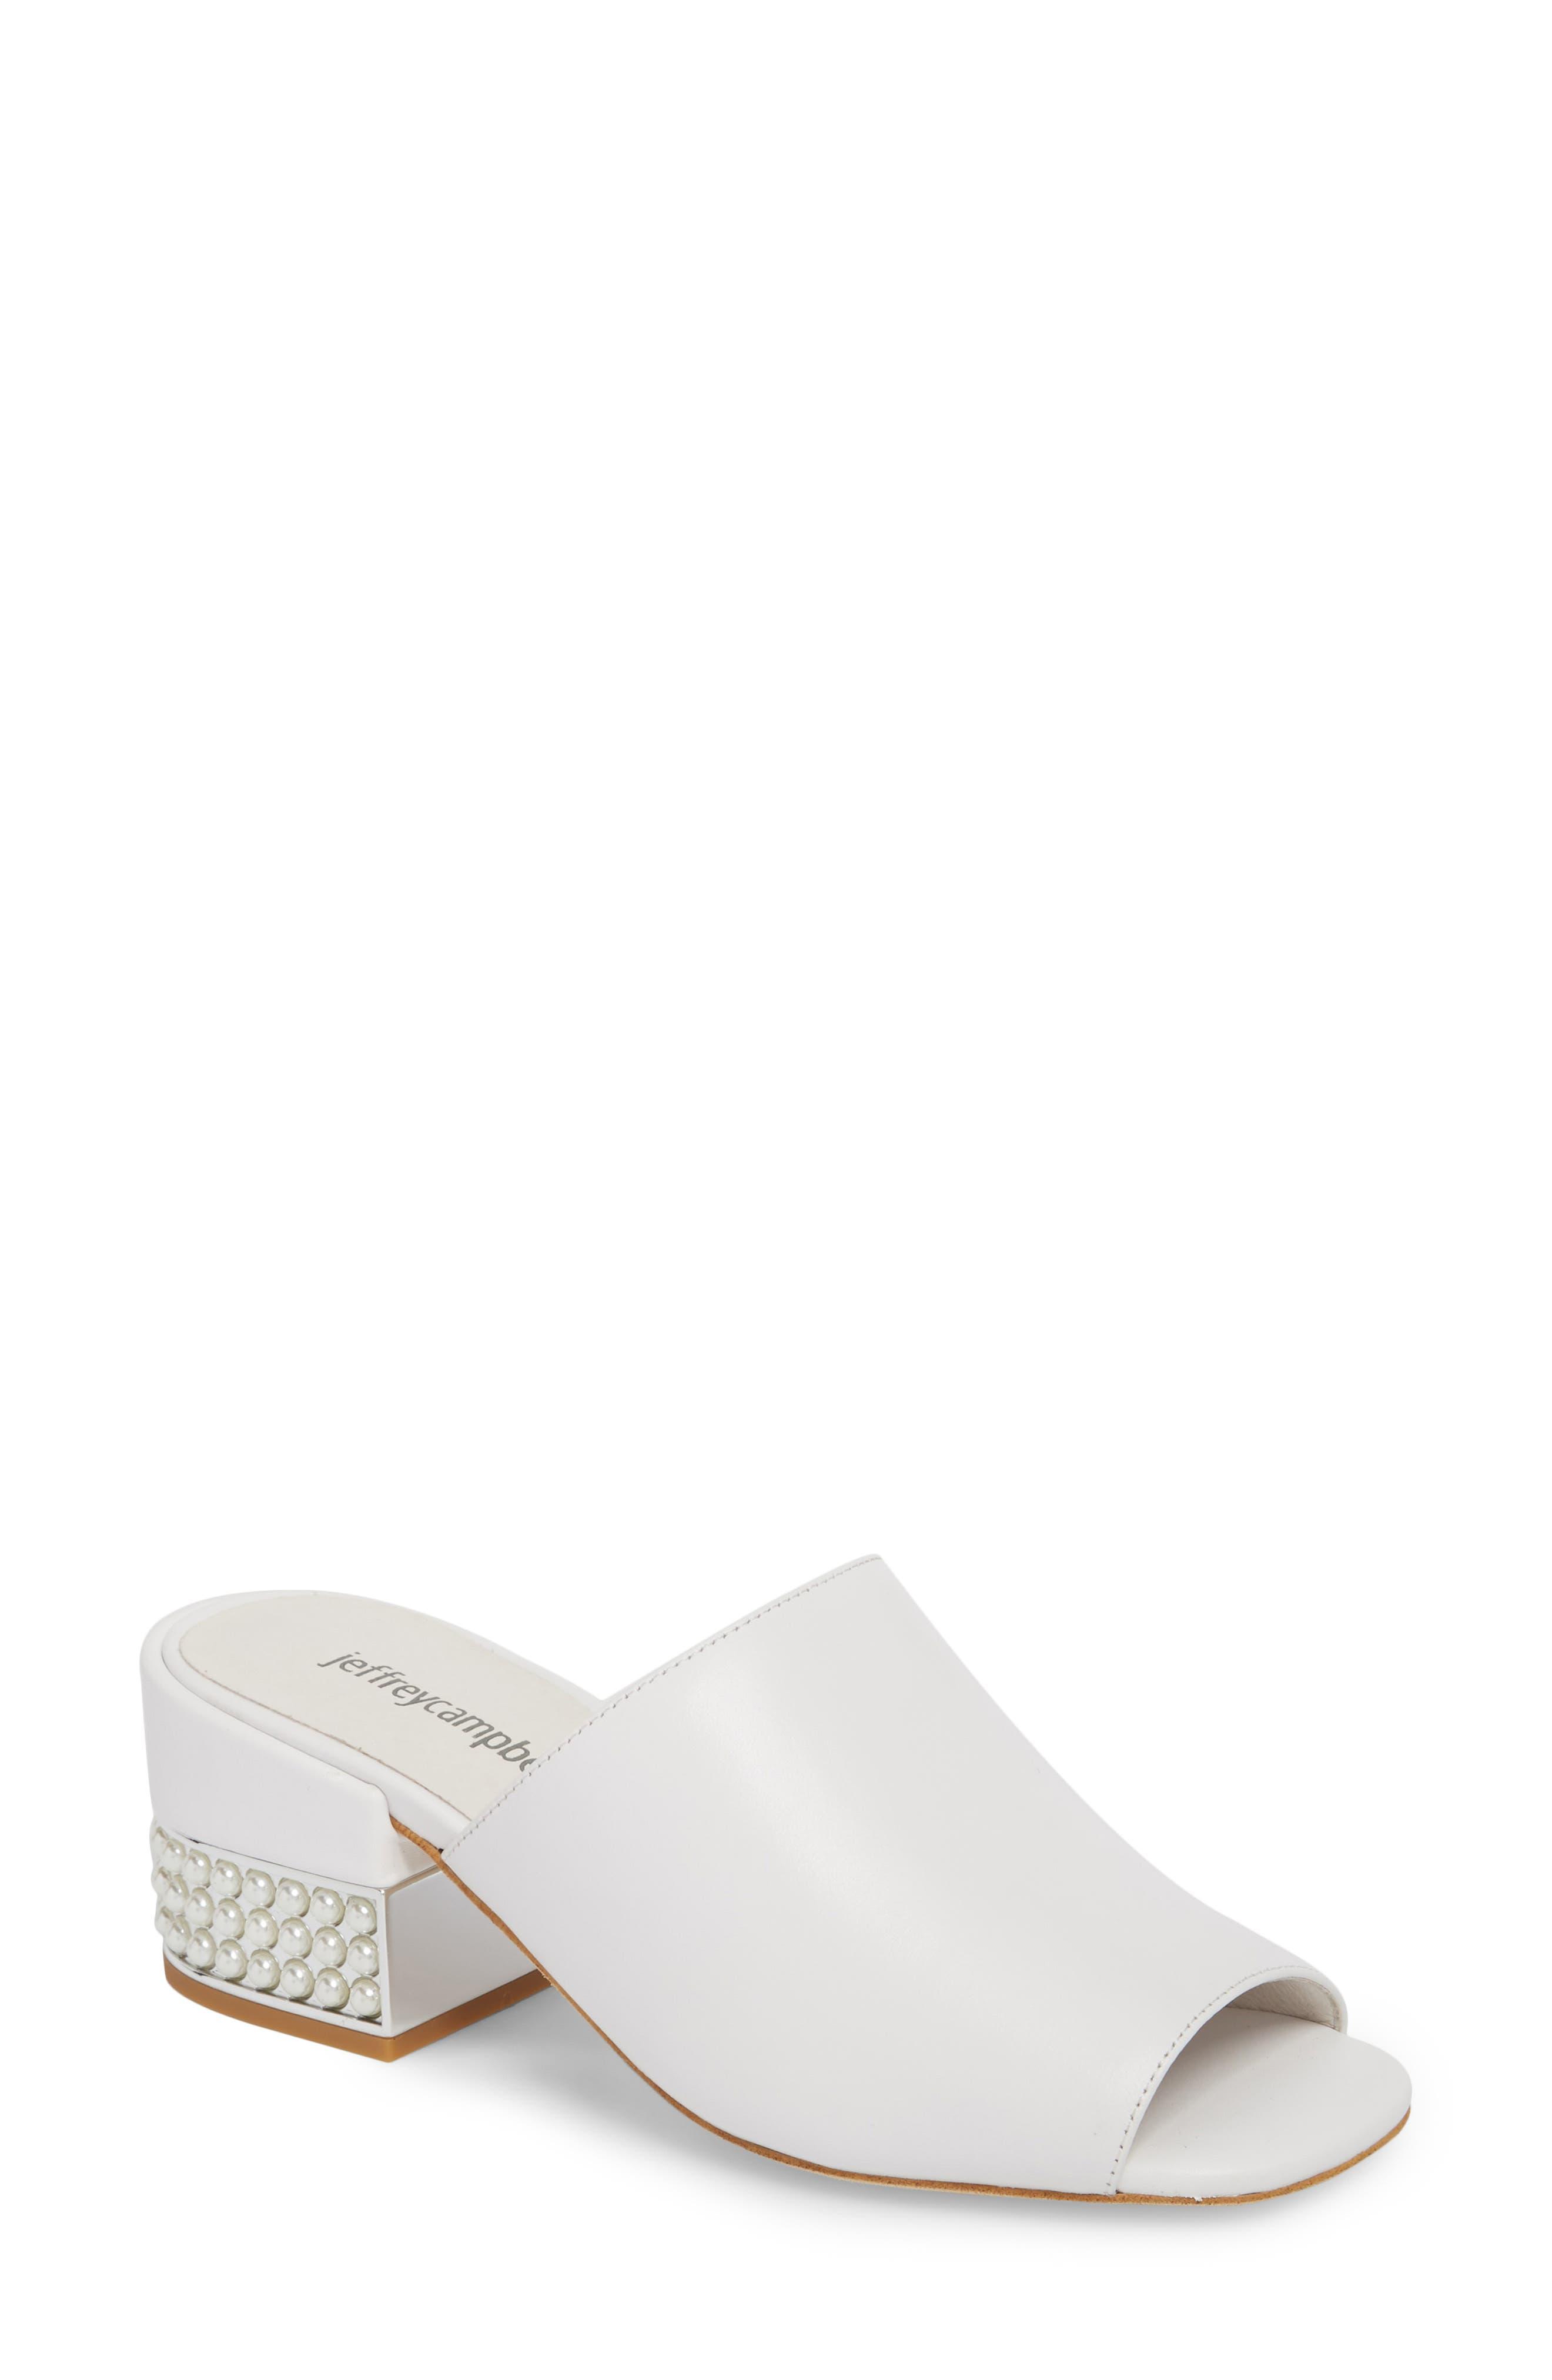 Teseida Embellished Mule,                         Main,                         color, White/ Silver